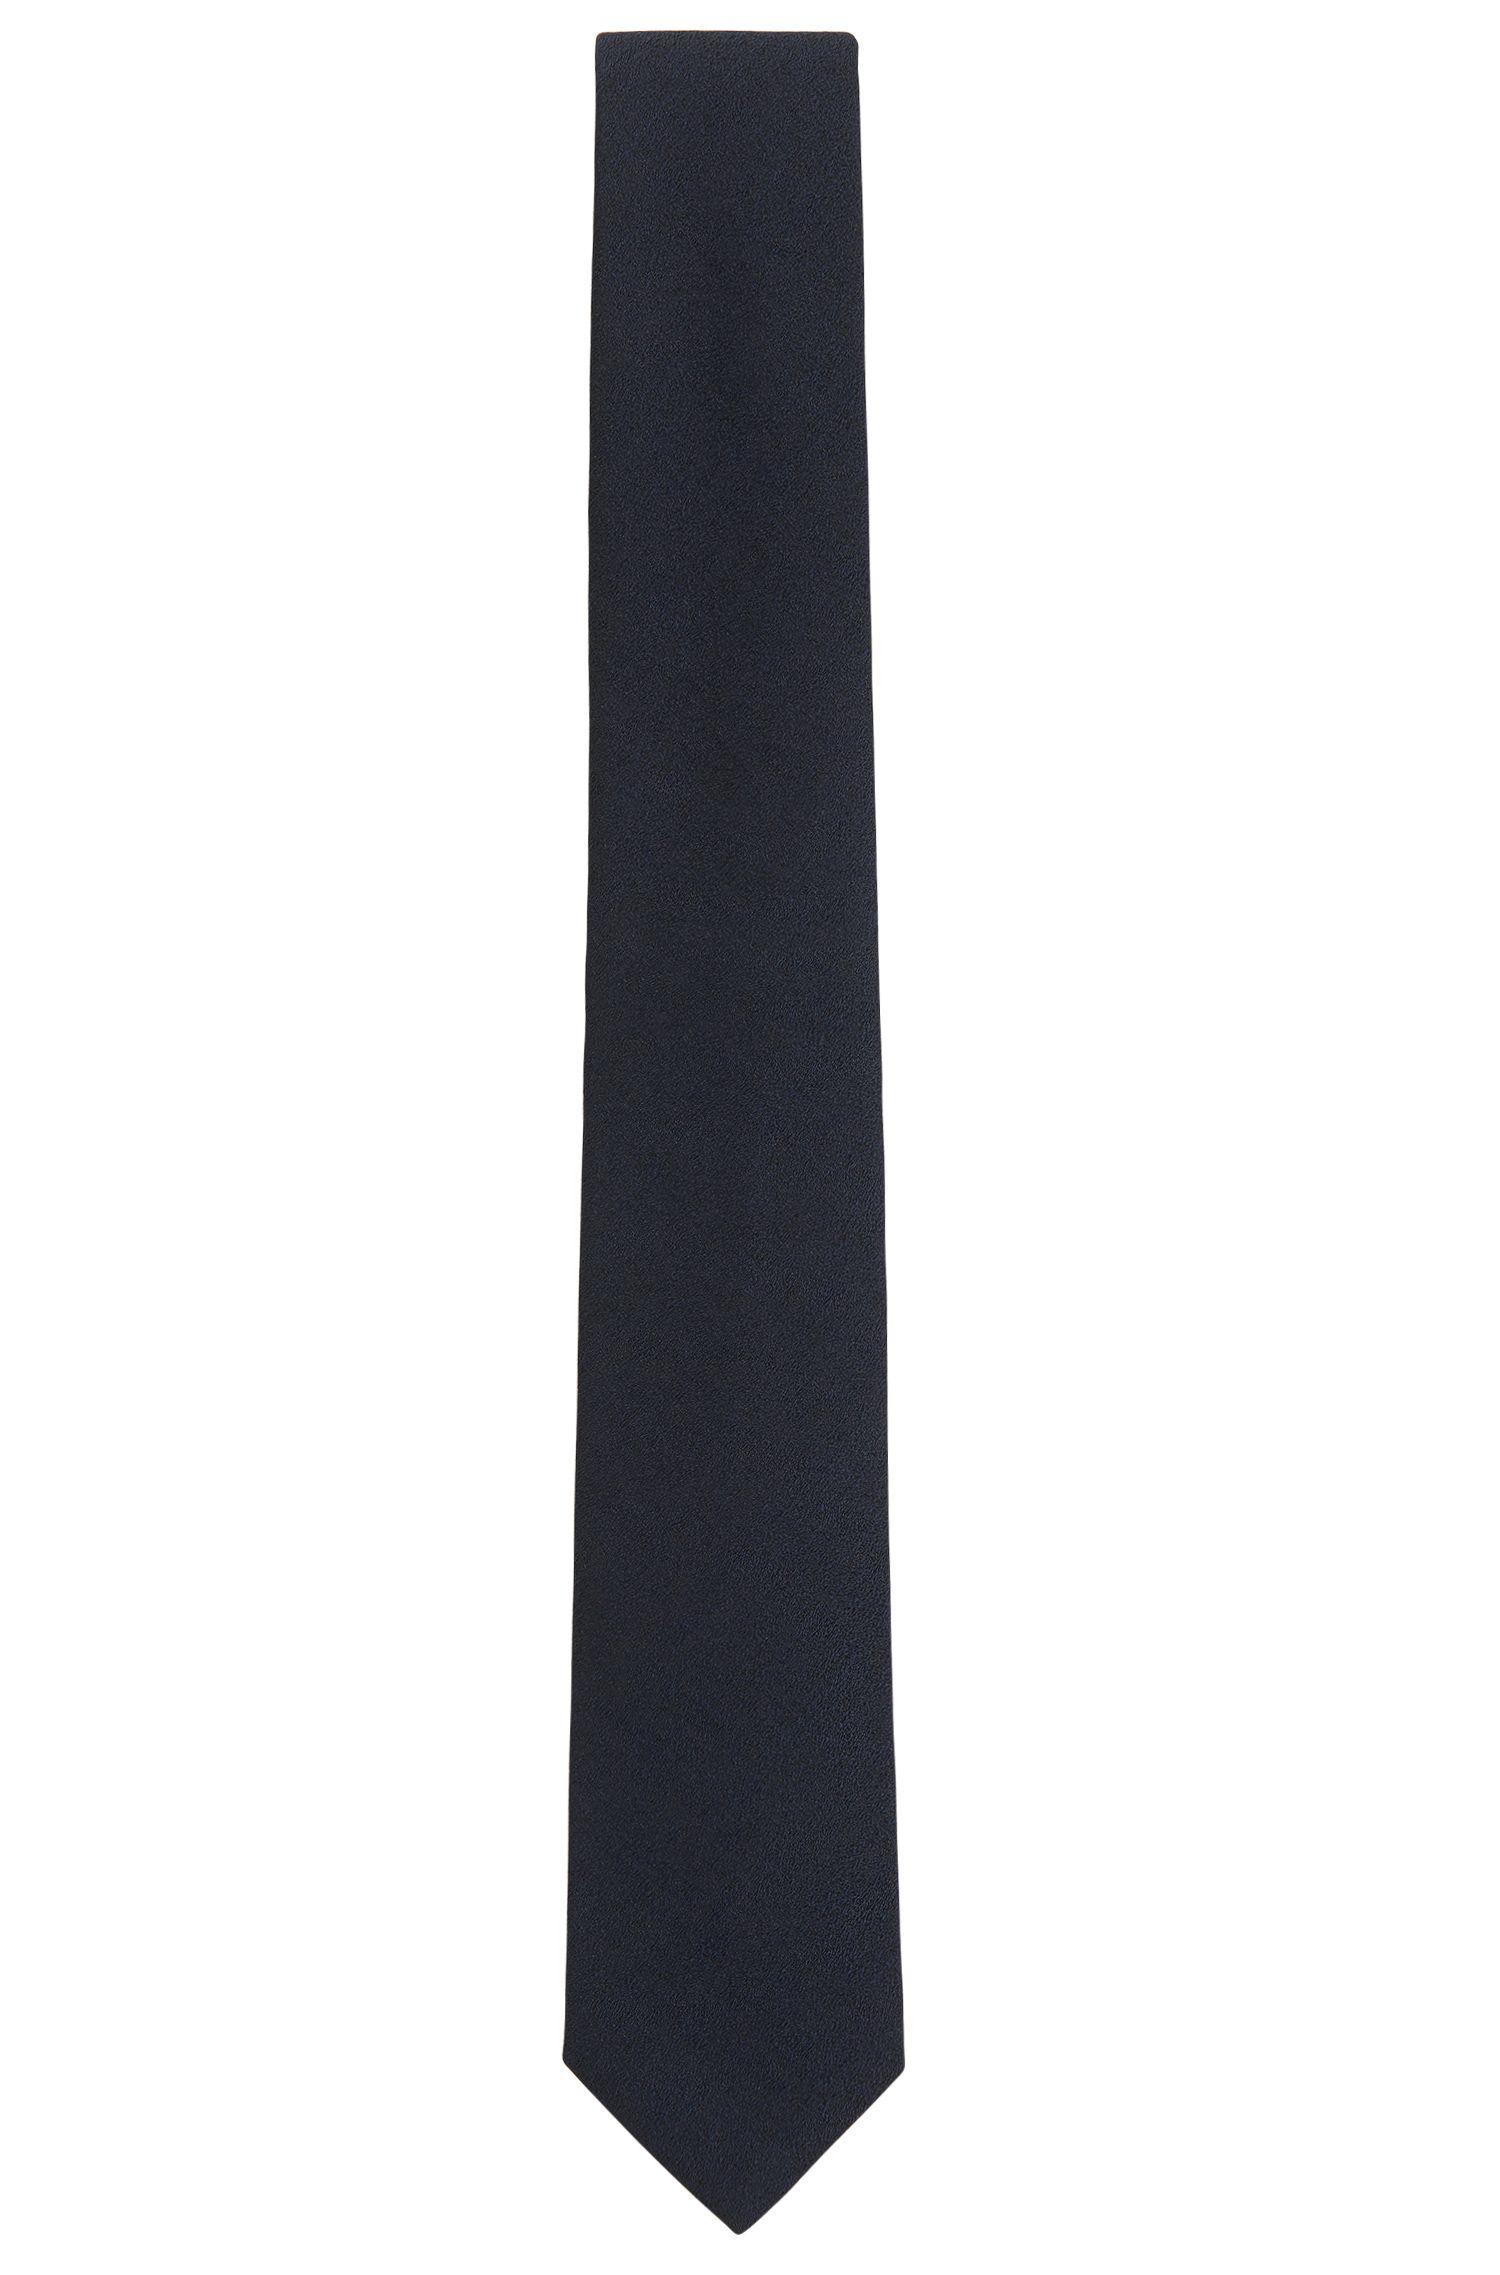 'T-Tie 6 cm' | Slim, Italian Wool Silk Tie